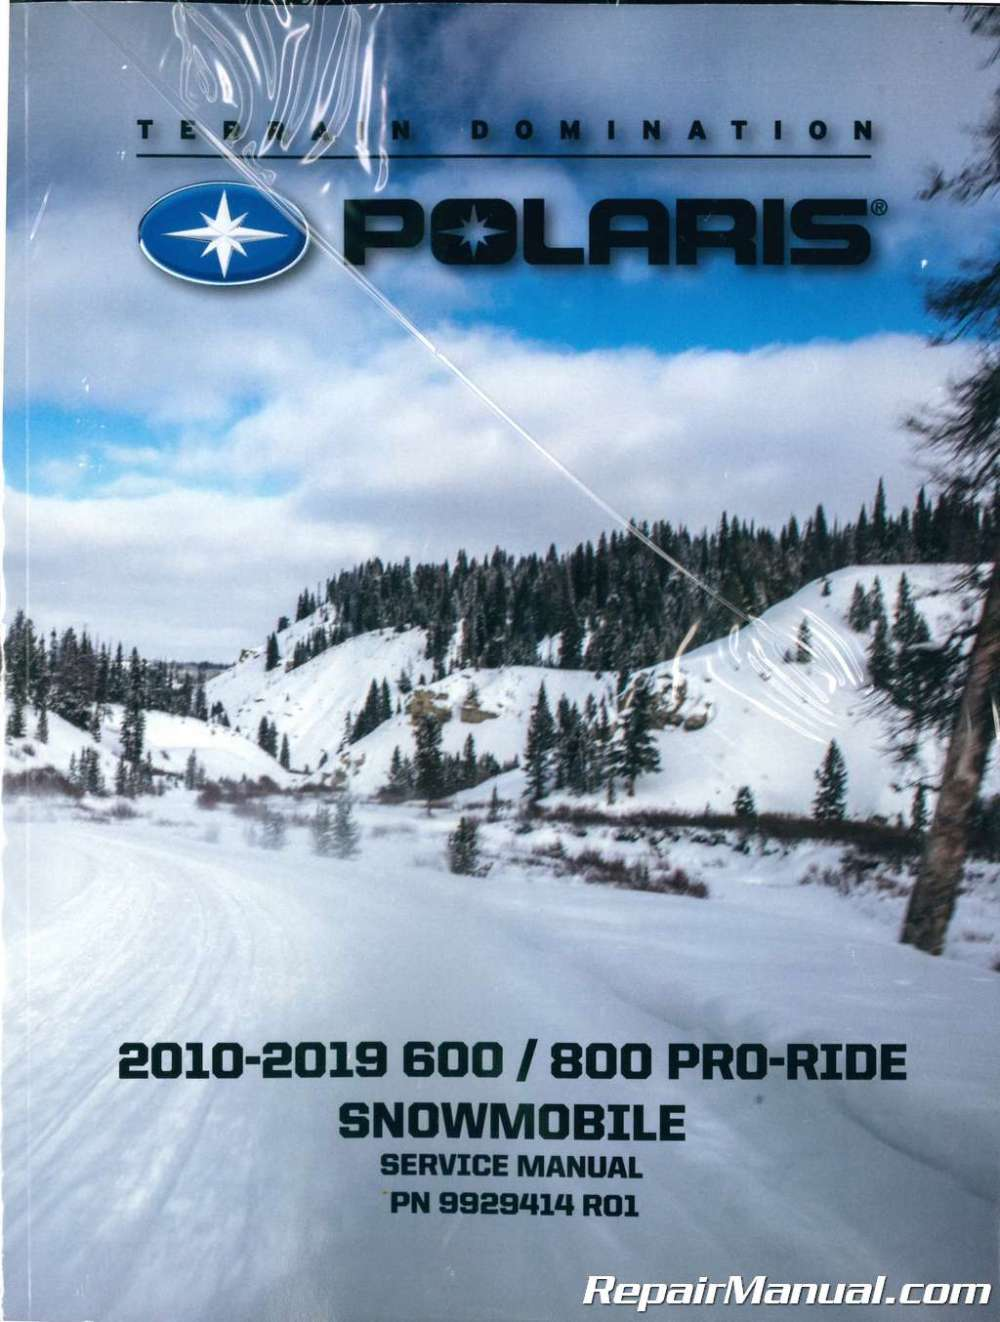 medium resolution of 2010 2019 polaris pro ride 600 800 snowmobile service manual2010 polaris lx 600 wiring diagram